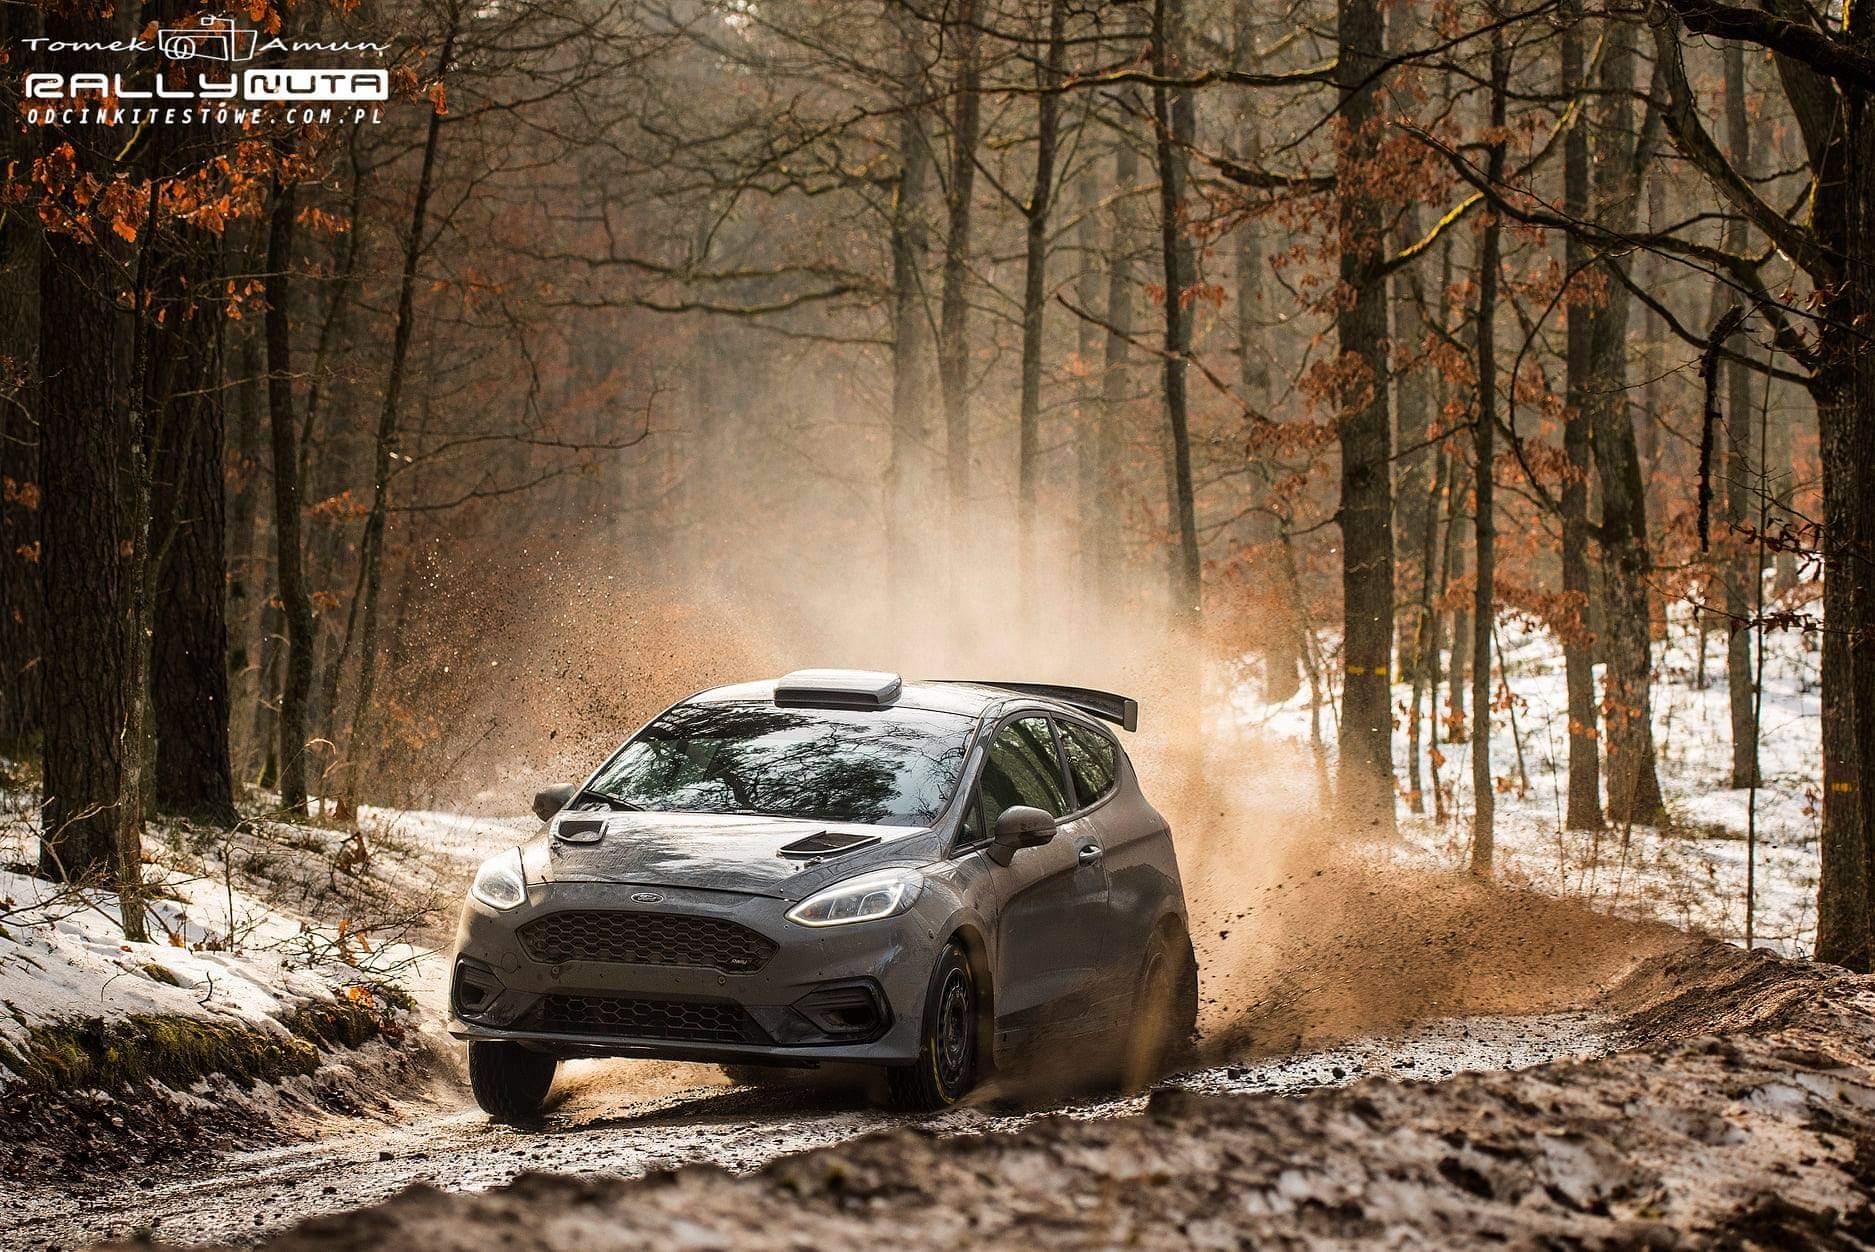 FIA European Rally Championship: Temporada 2021 - Página 3 EvBNeSqXIAUN4dU?format=jpg&name=large